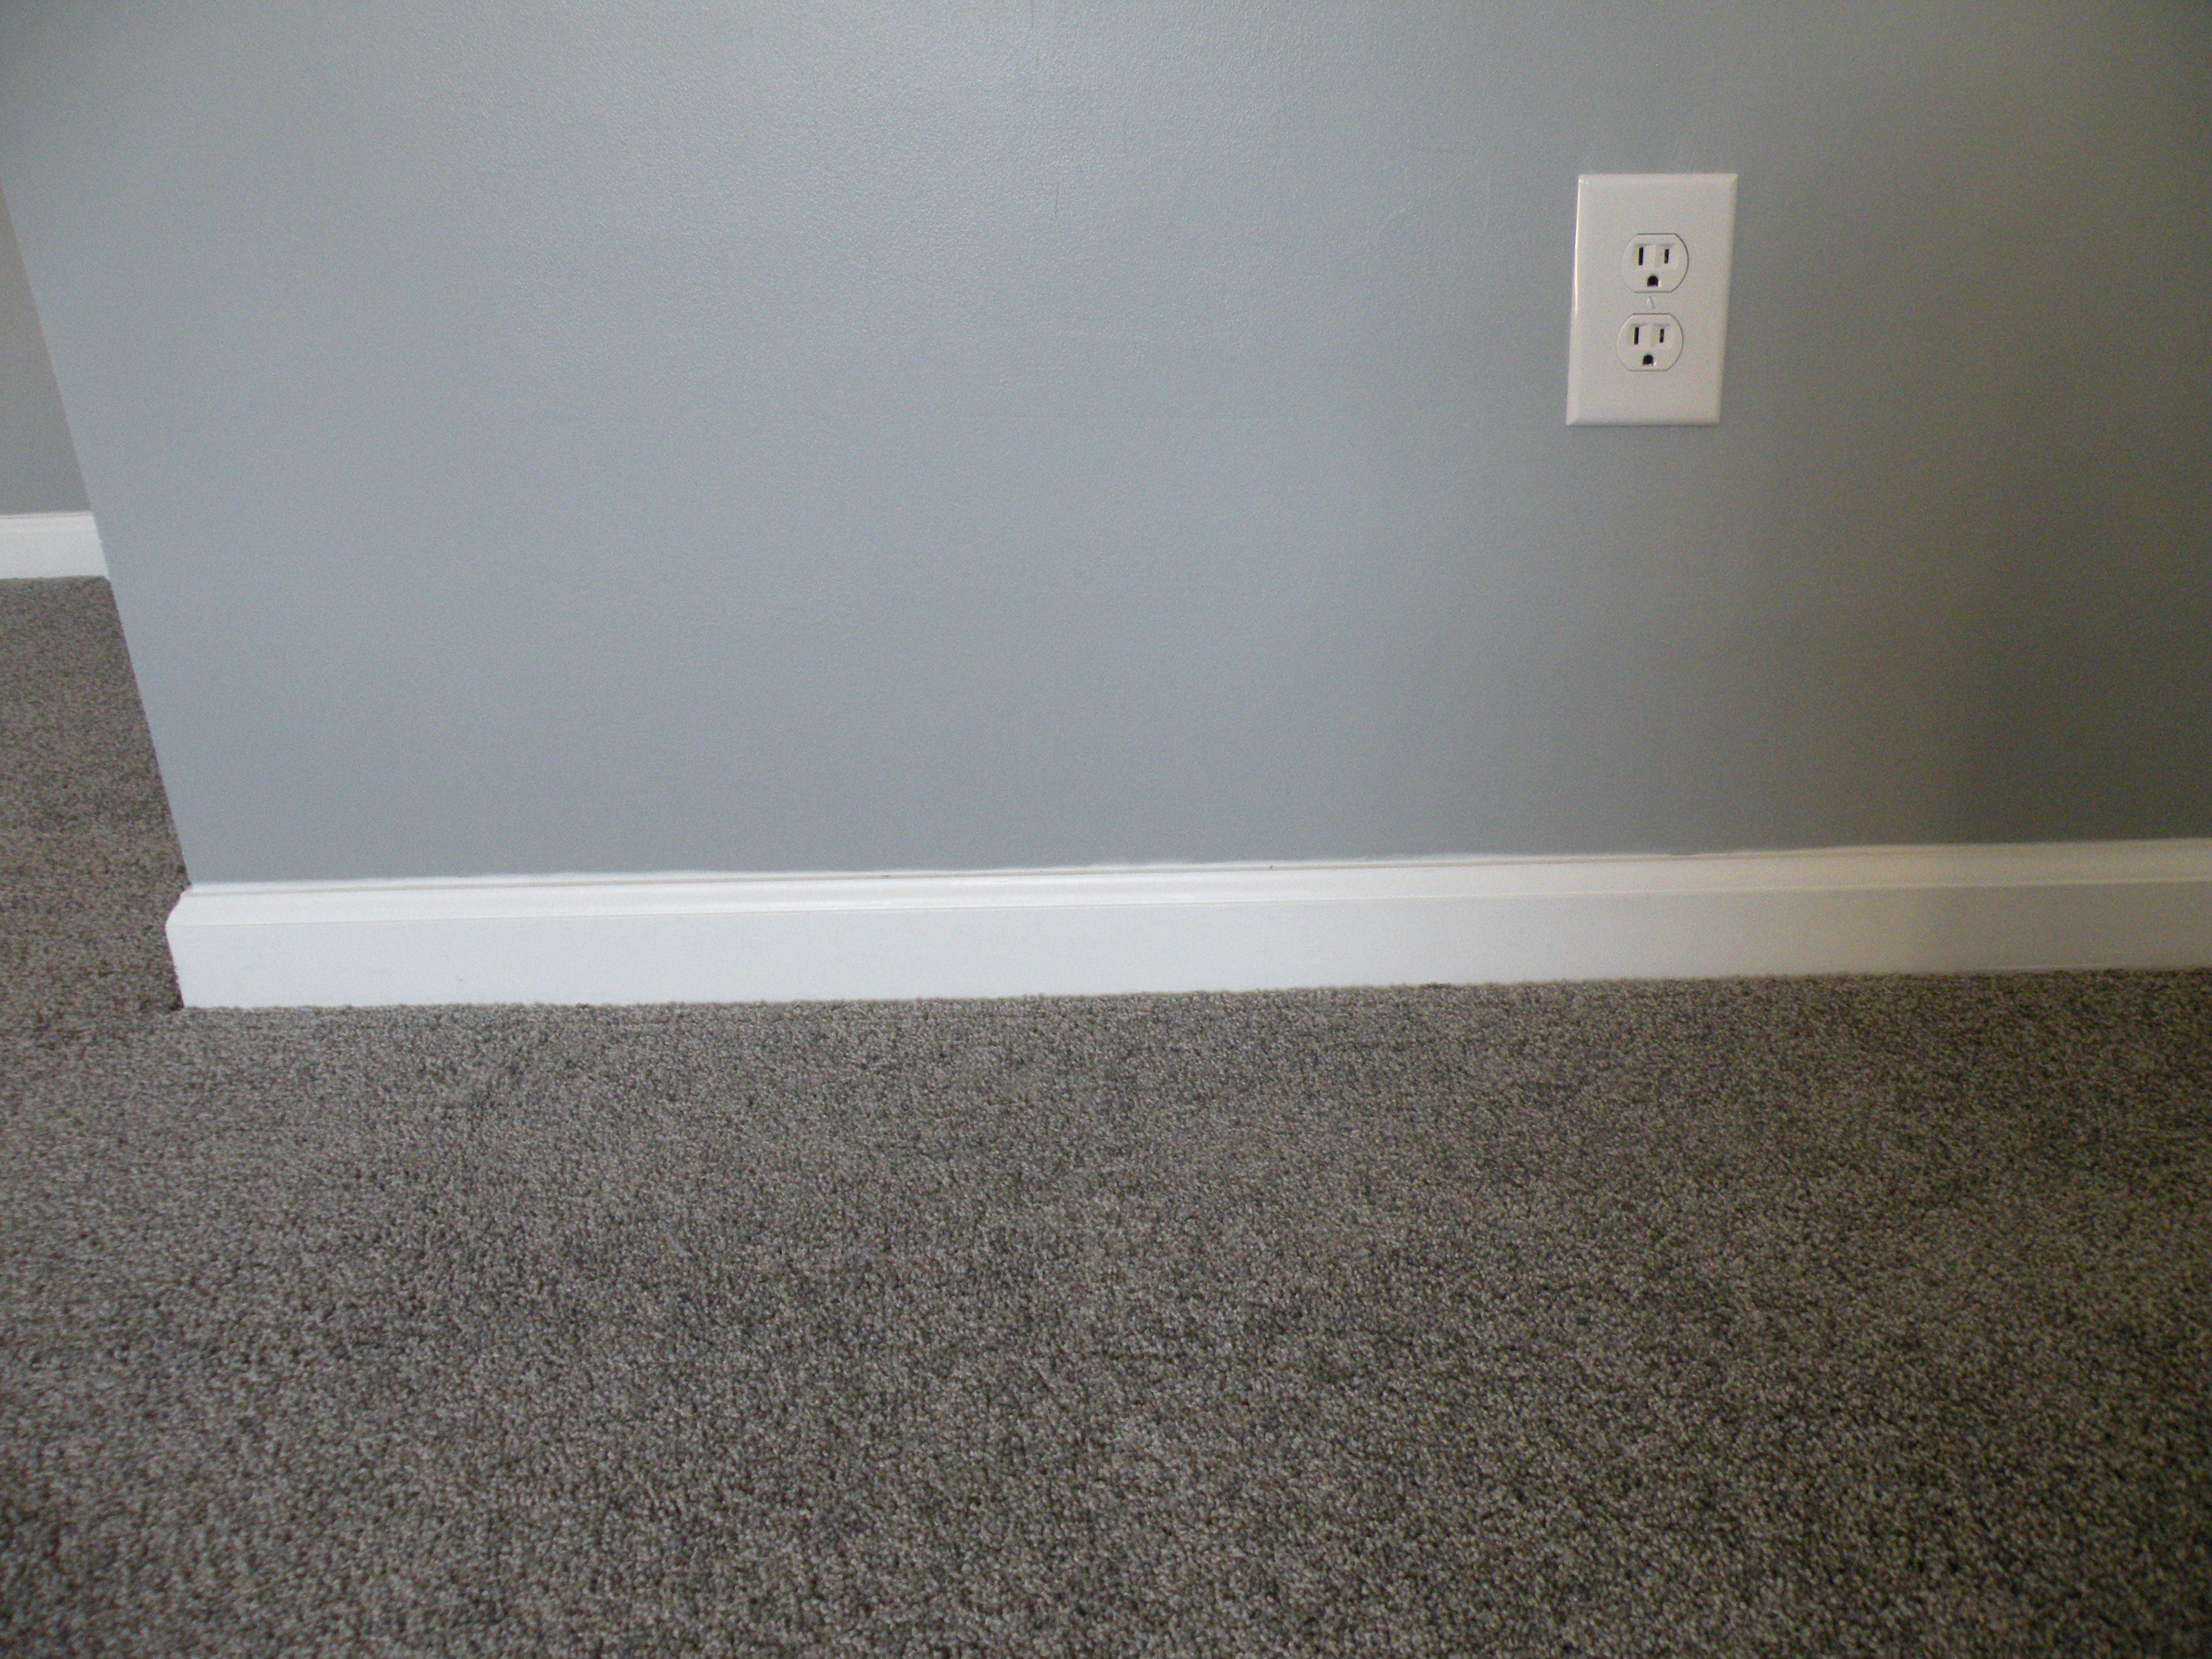 Light Grey Sofa With Dark Carpet Flex Steel Table Colors Color Walls Blue Basement Gray